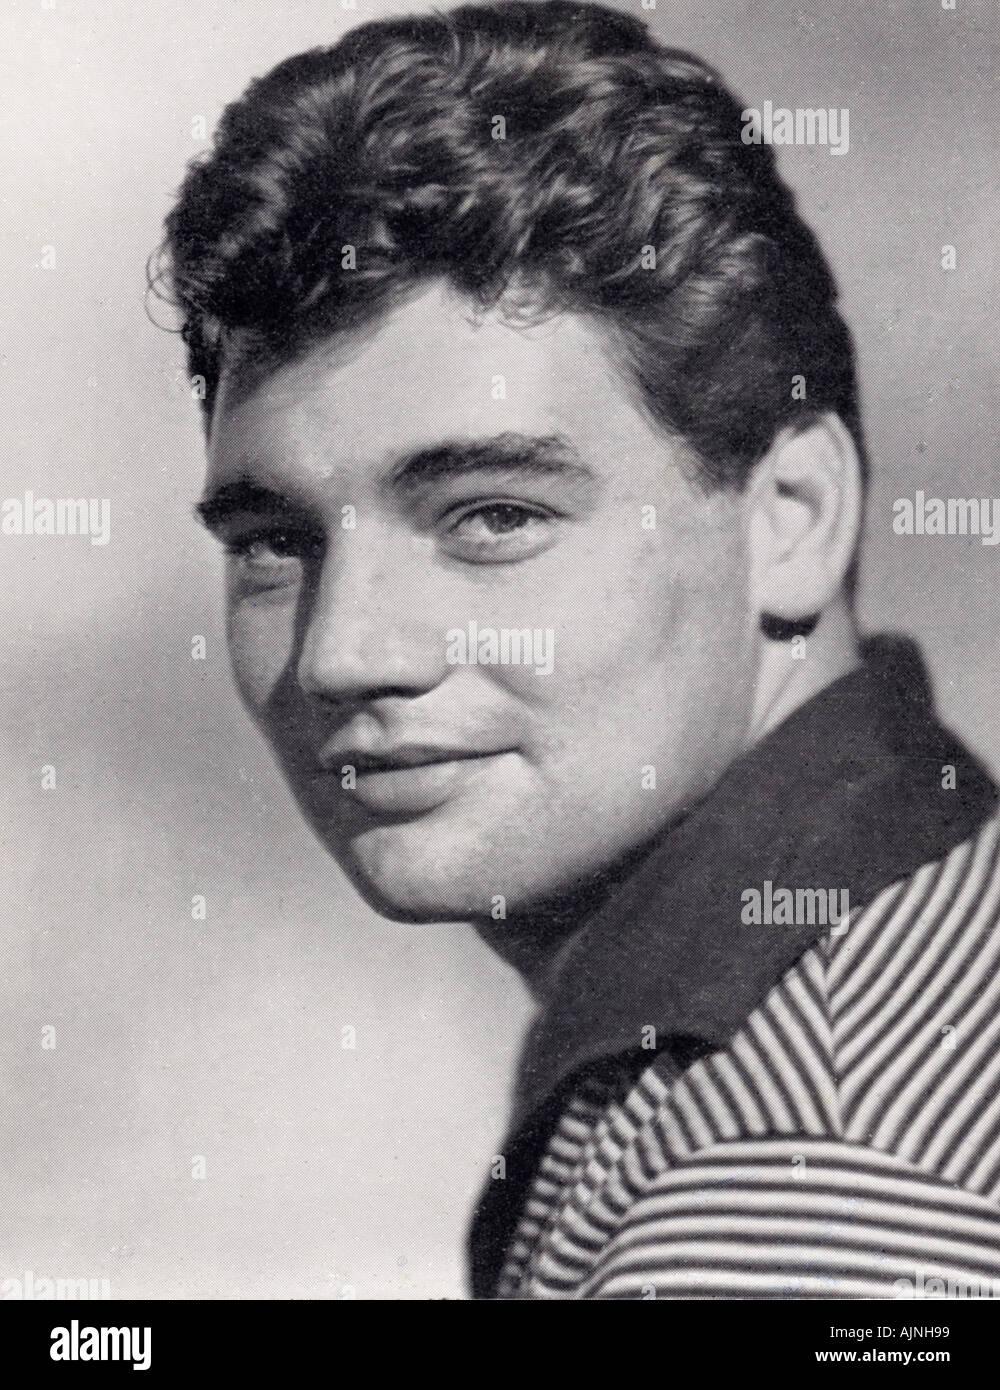 MIKE PRESTON UK singer whose big hit was Mr Blue in 1959 ...